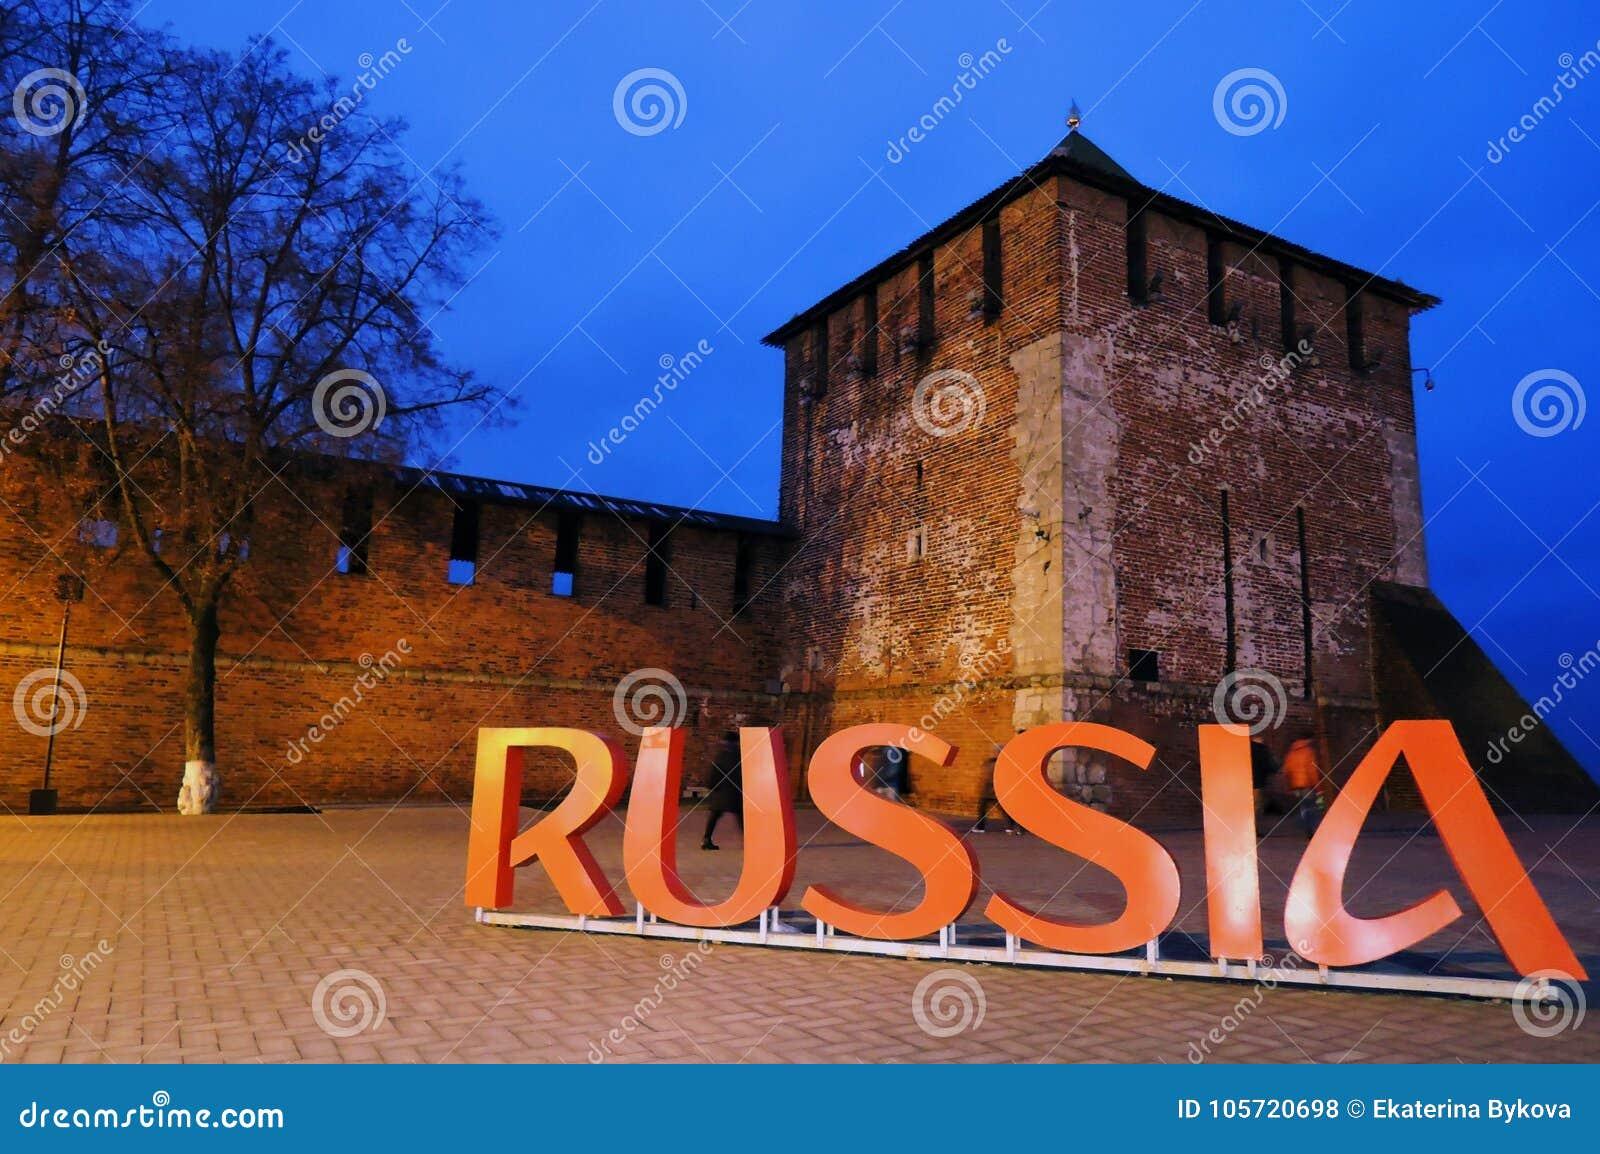 Old tower. Kremlin in Nizhny Novgorod, Russia.